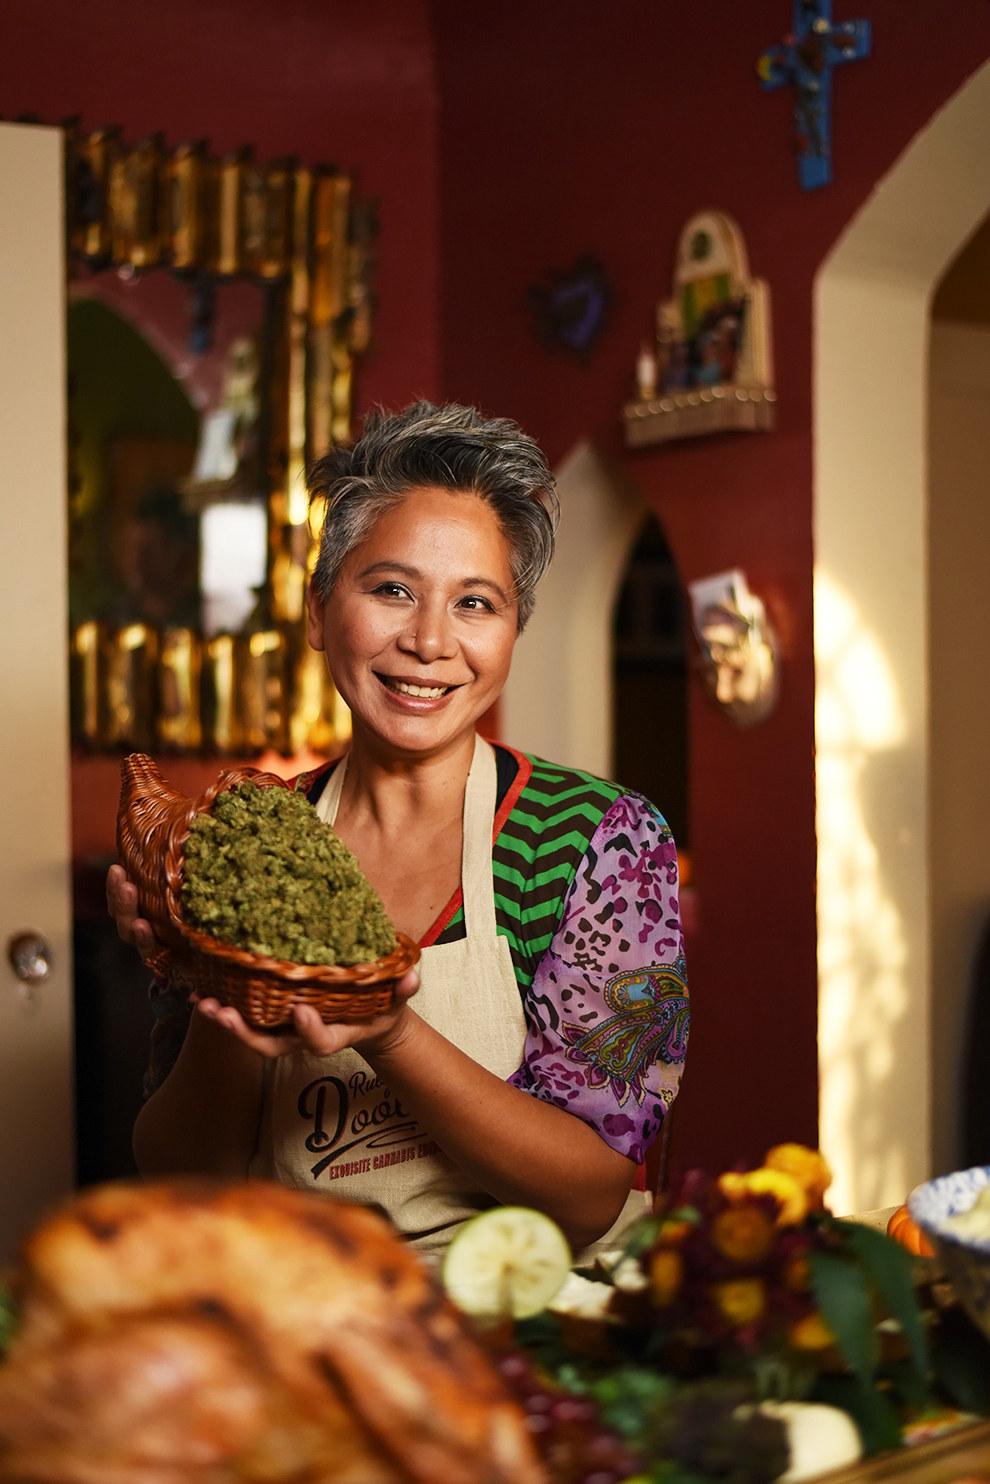 Happy Danksgiving: An Elevated Feast